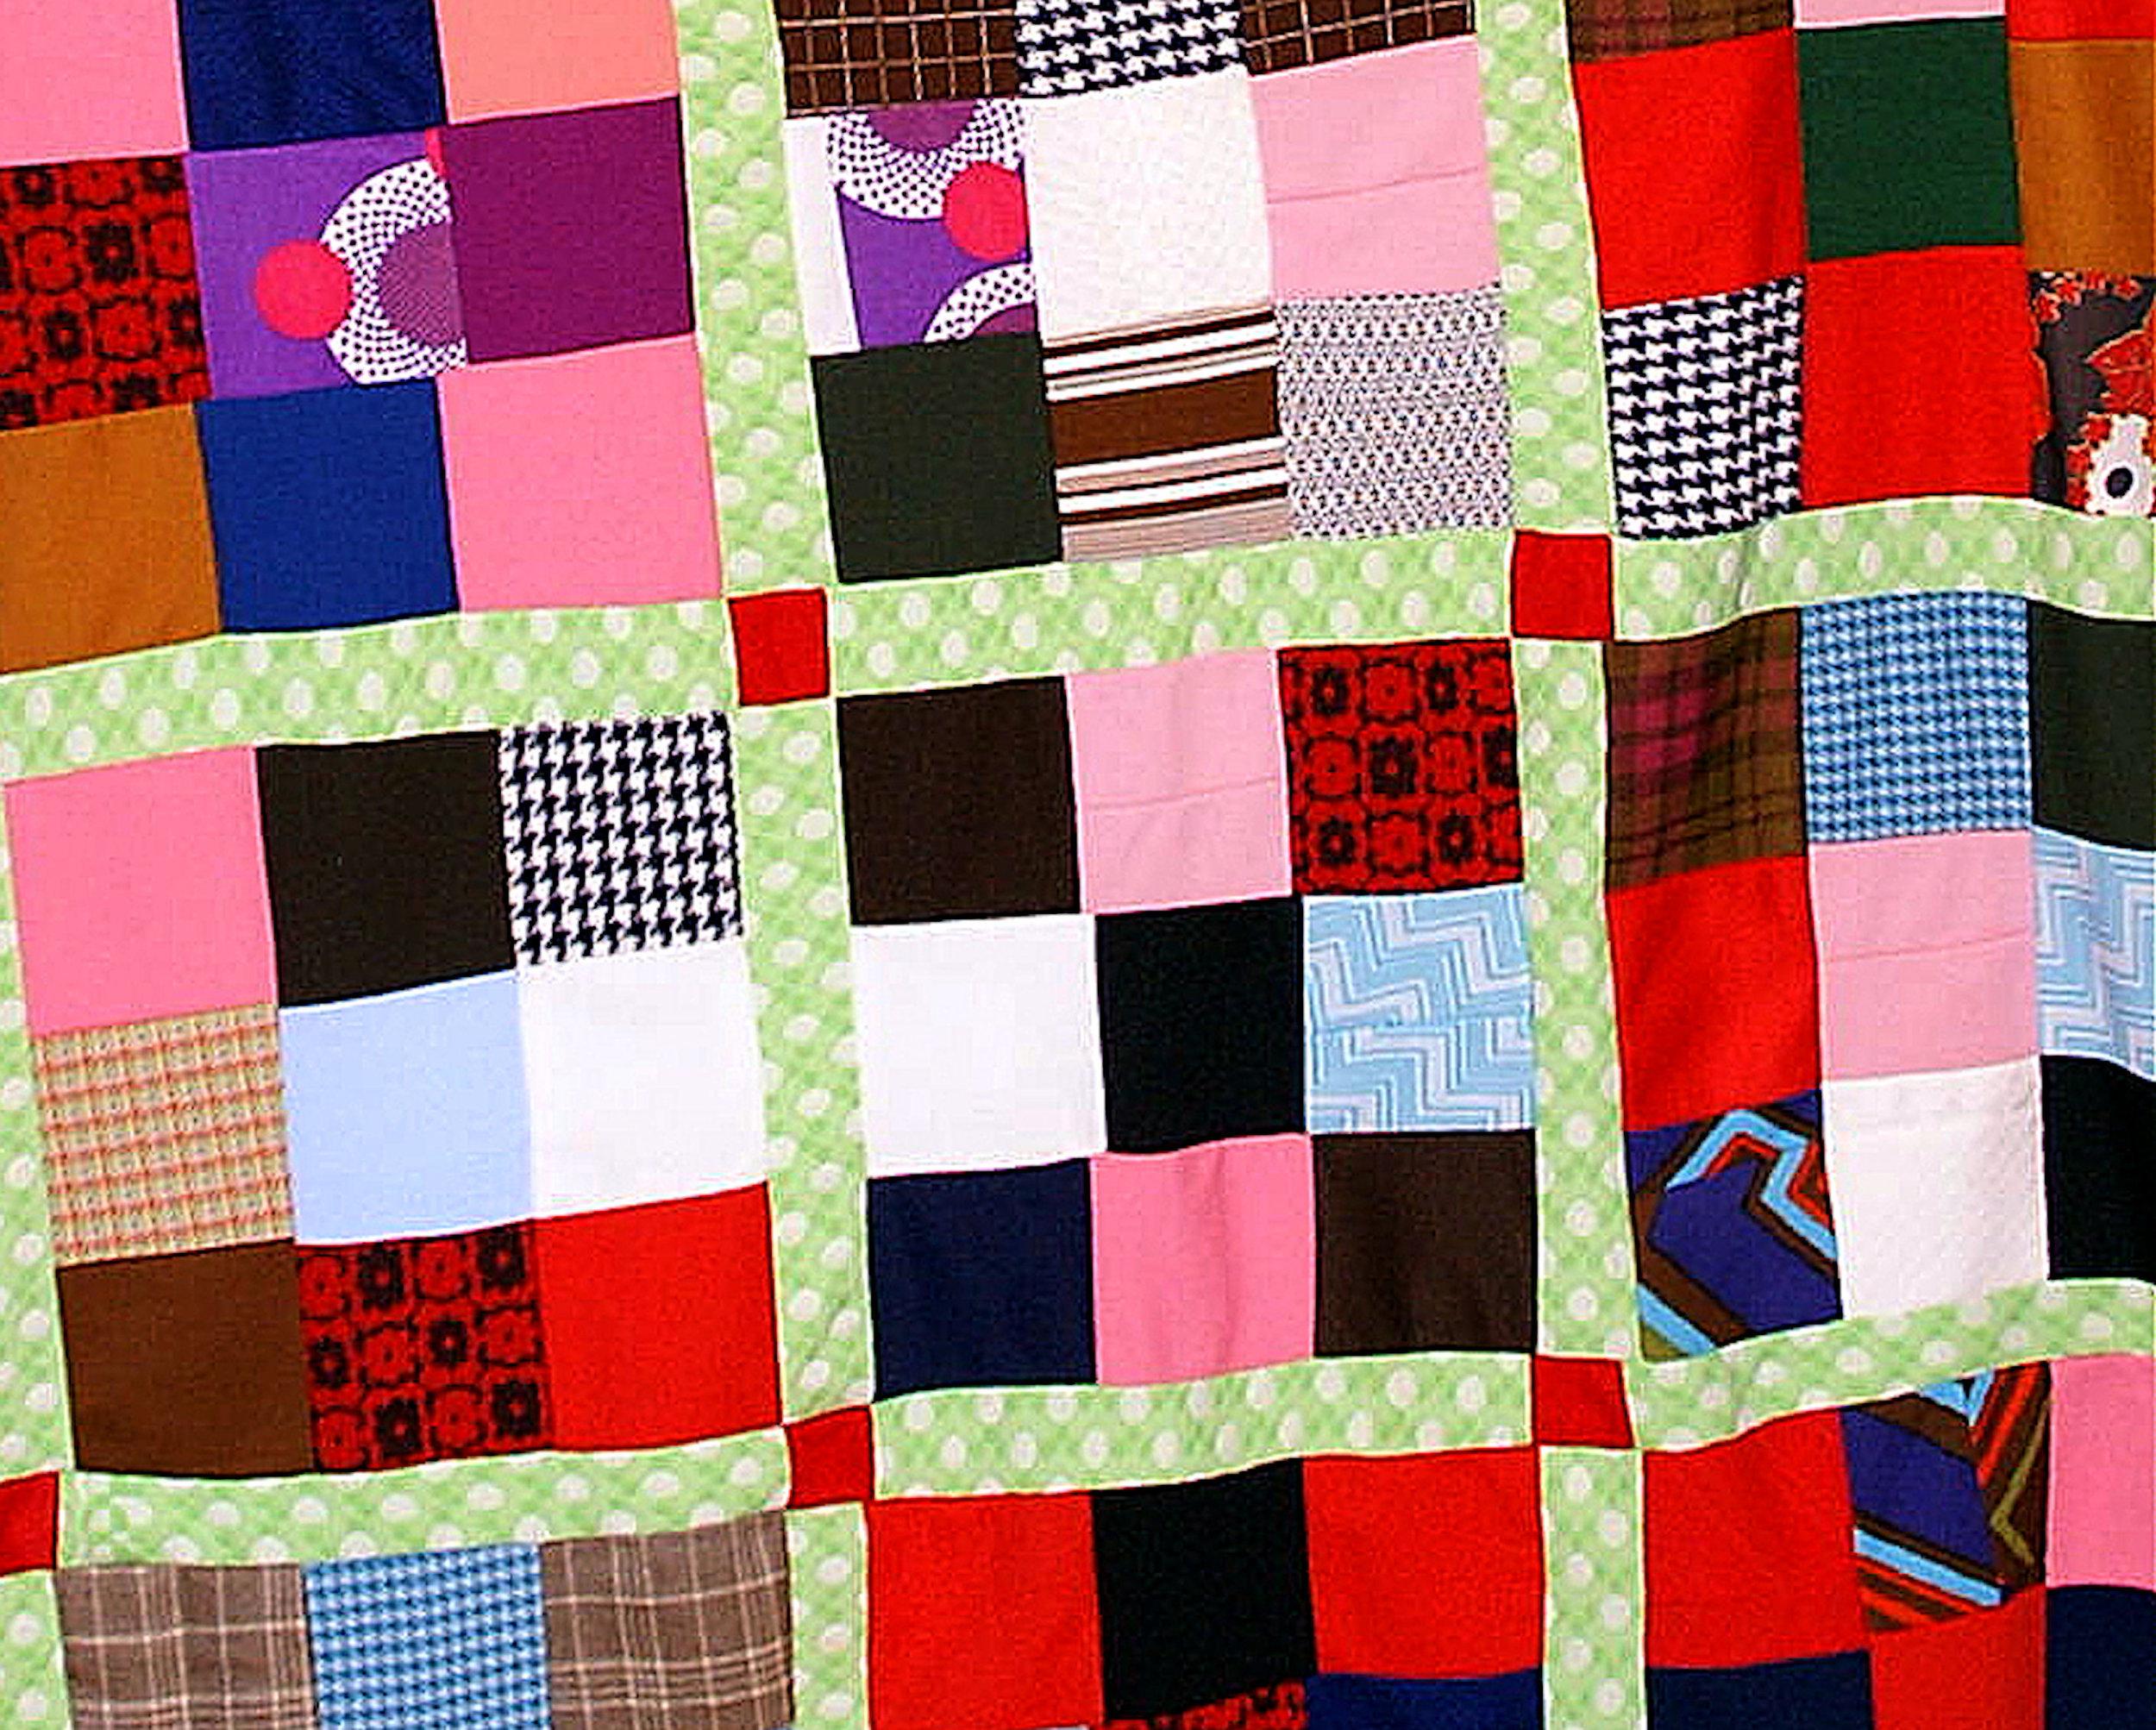 Sappony Quilt block pattern Mary Edna Martin 1970s.jpg